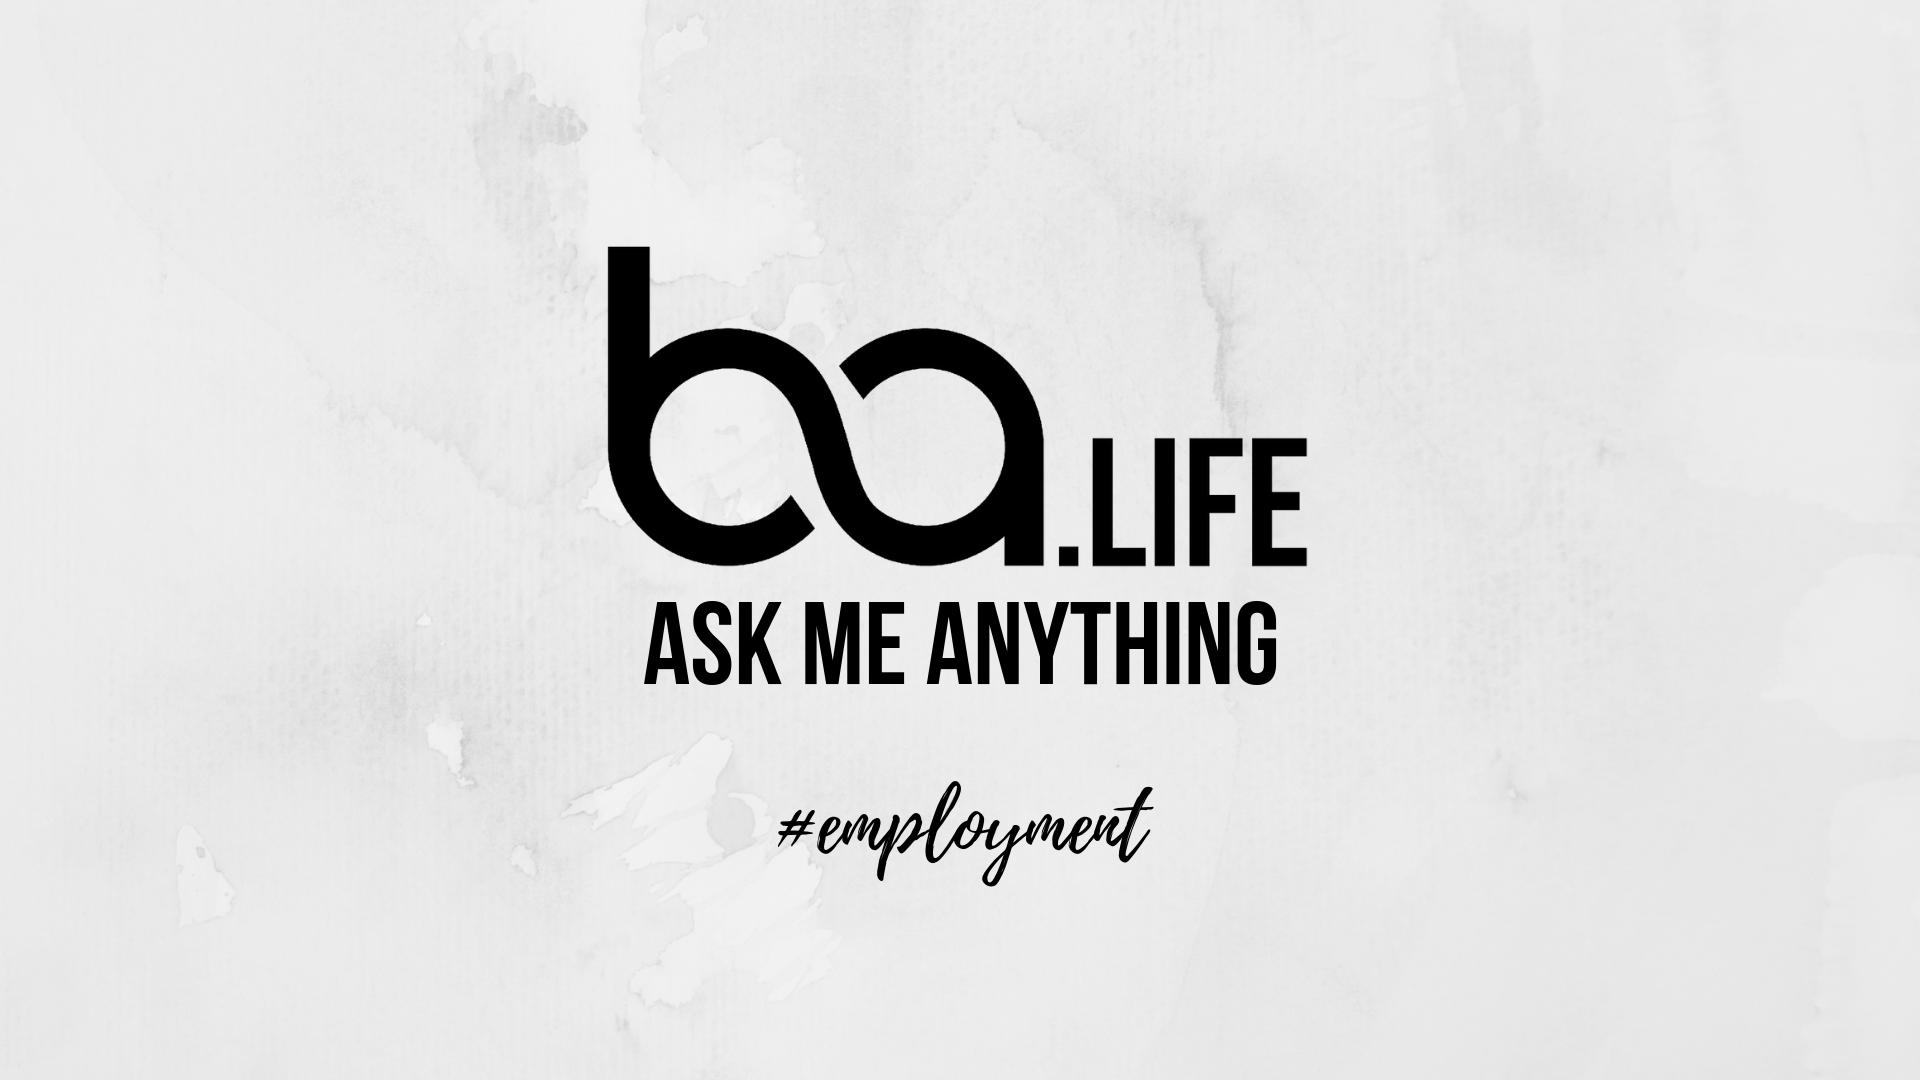 Bdec5d6e327c53914ab0dcf778afaab19300ccb1 ask me anything 3